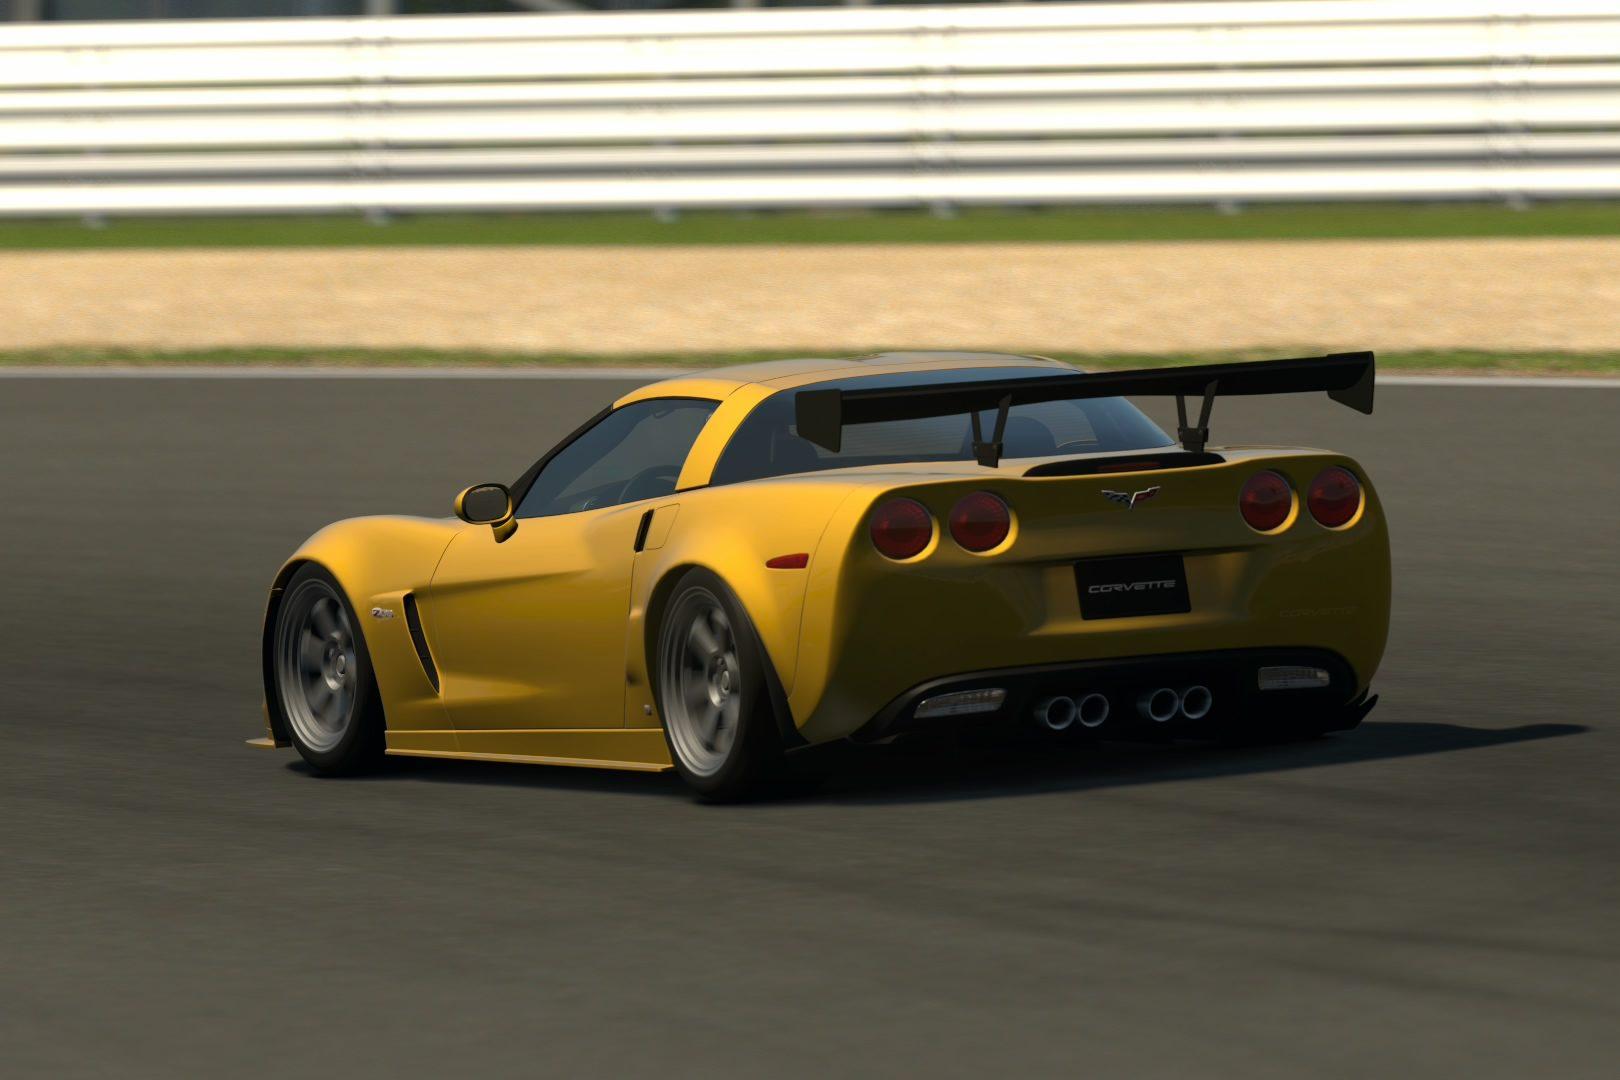 Apricot Hill Raceway_52.jpg